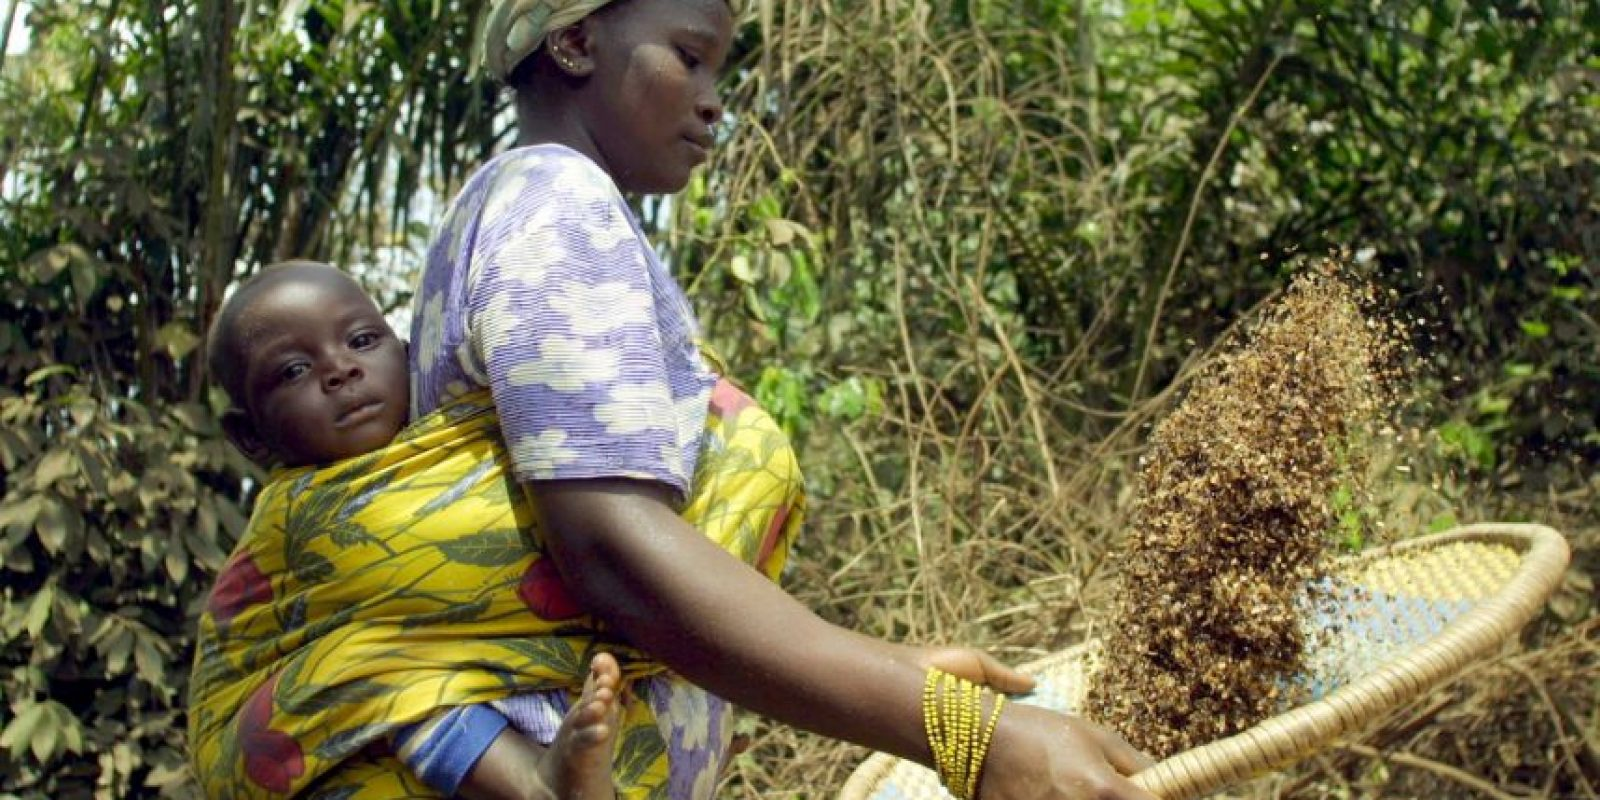 Costa de Marfil (151) Foto:Getty Images